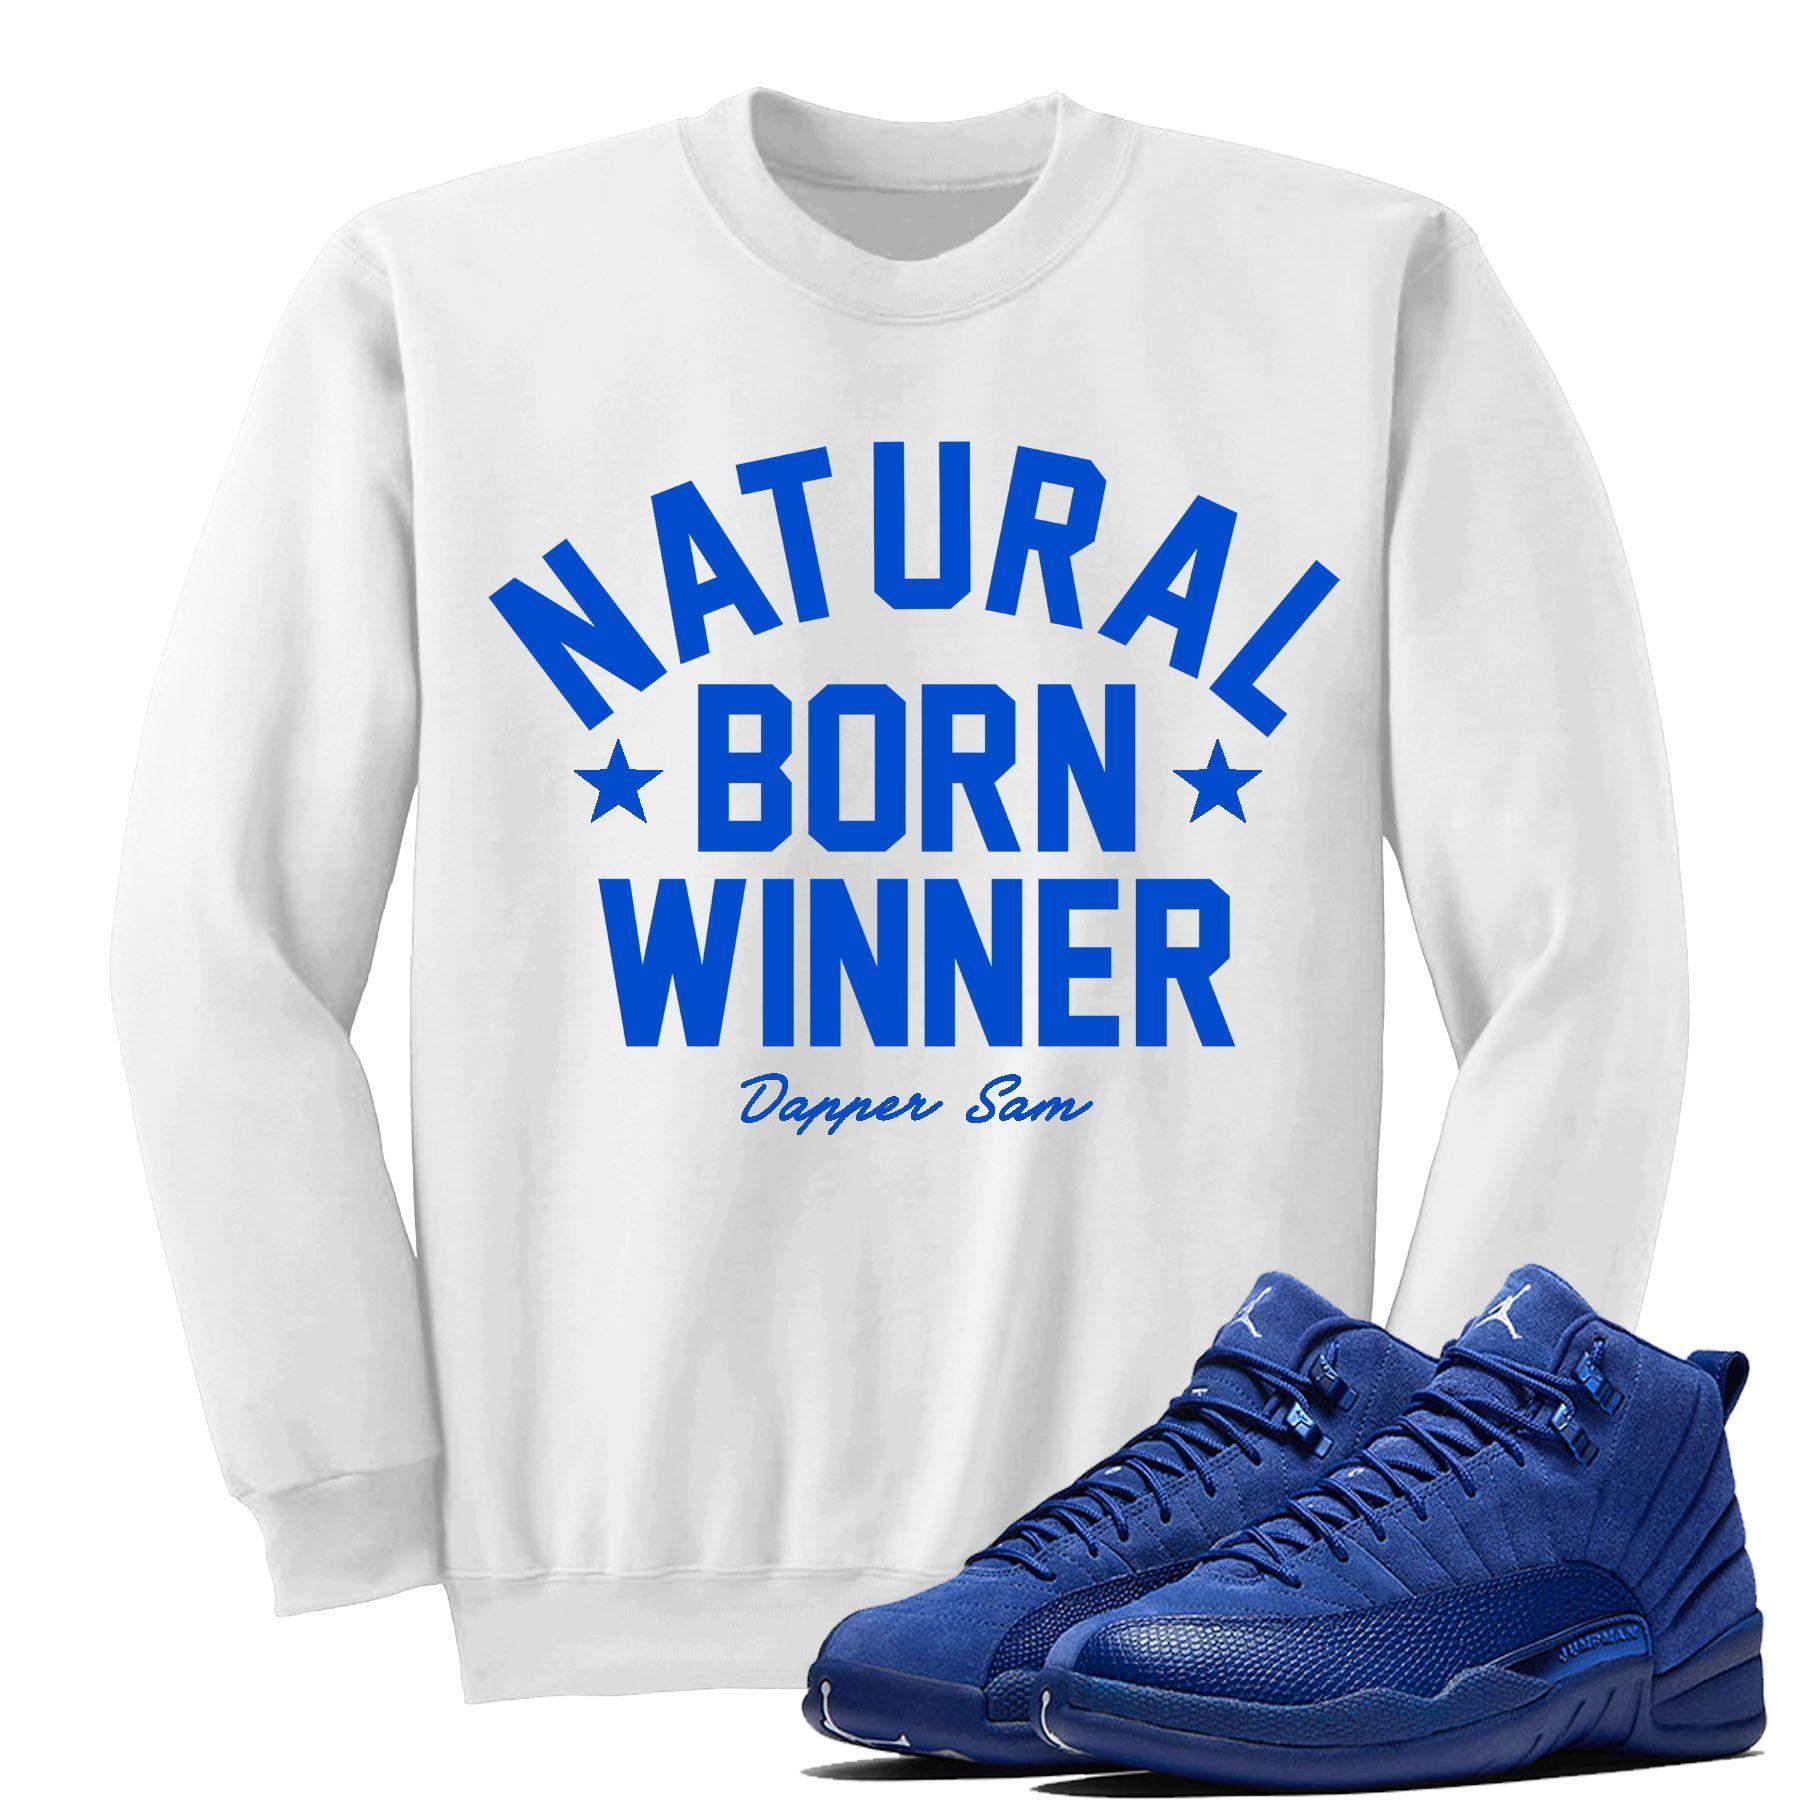 df3dd7cc9dd NATURAL BORN(SWEATER)- Jordan BLUE SUEDE 12 s Sneaker Match T-Shirt Tees